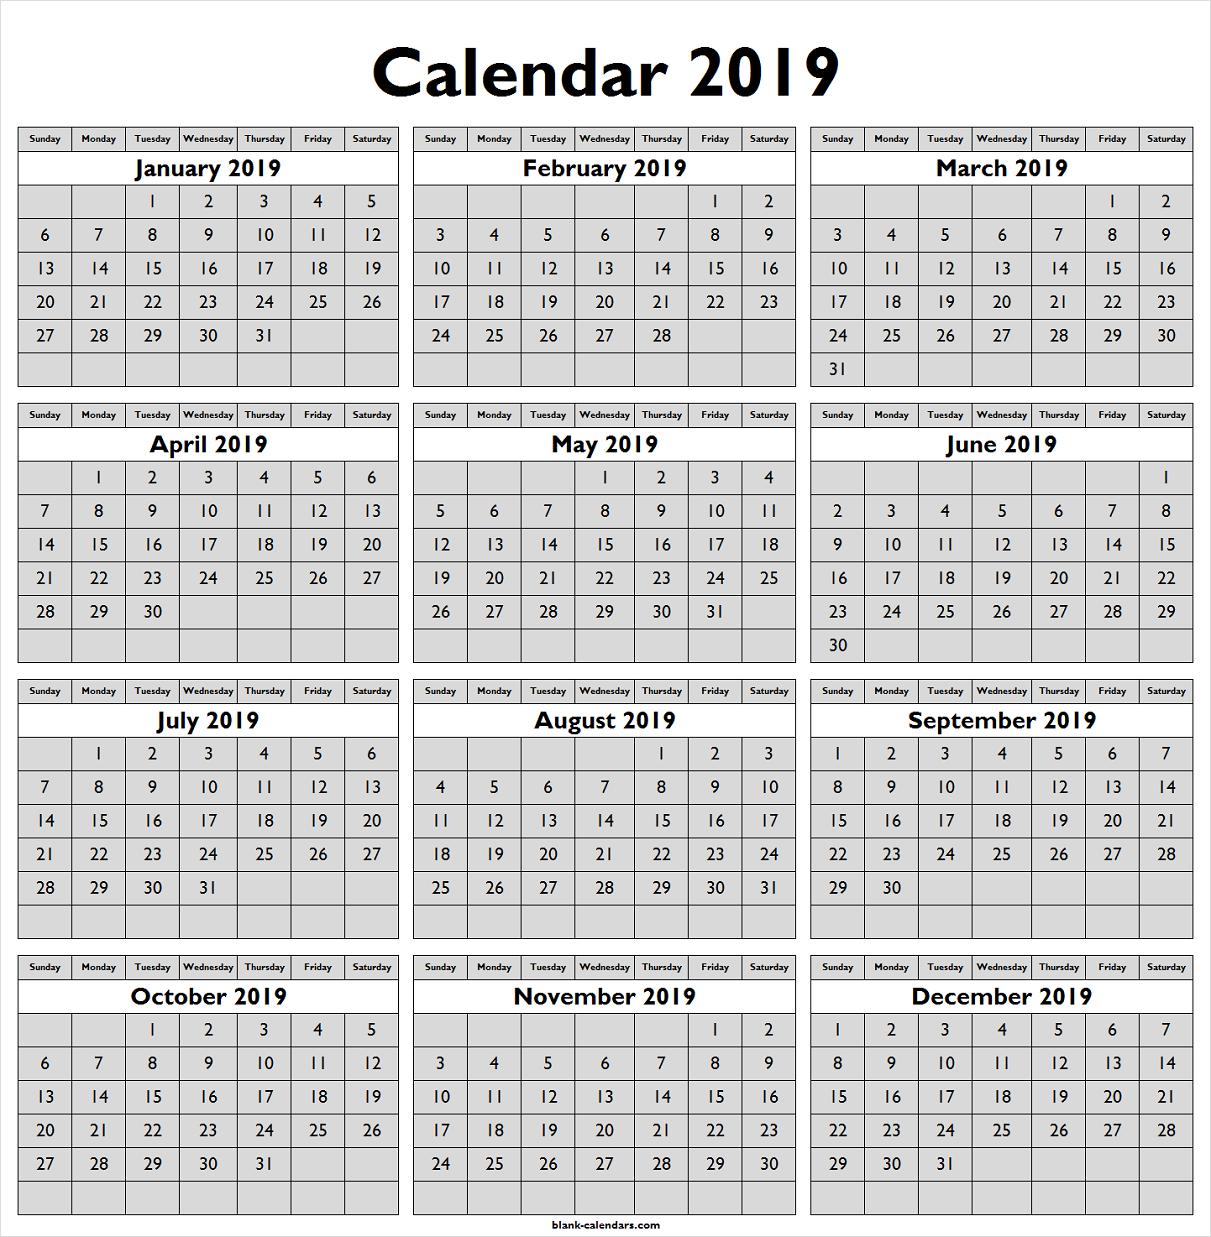 Calendar 2019 Png Free Download Calendar Free Calendars To Print Calendar 2019 Template